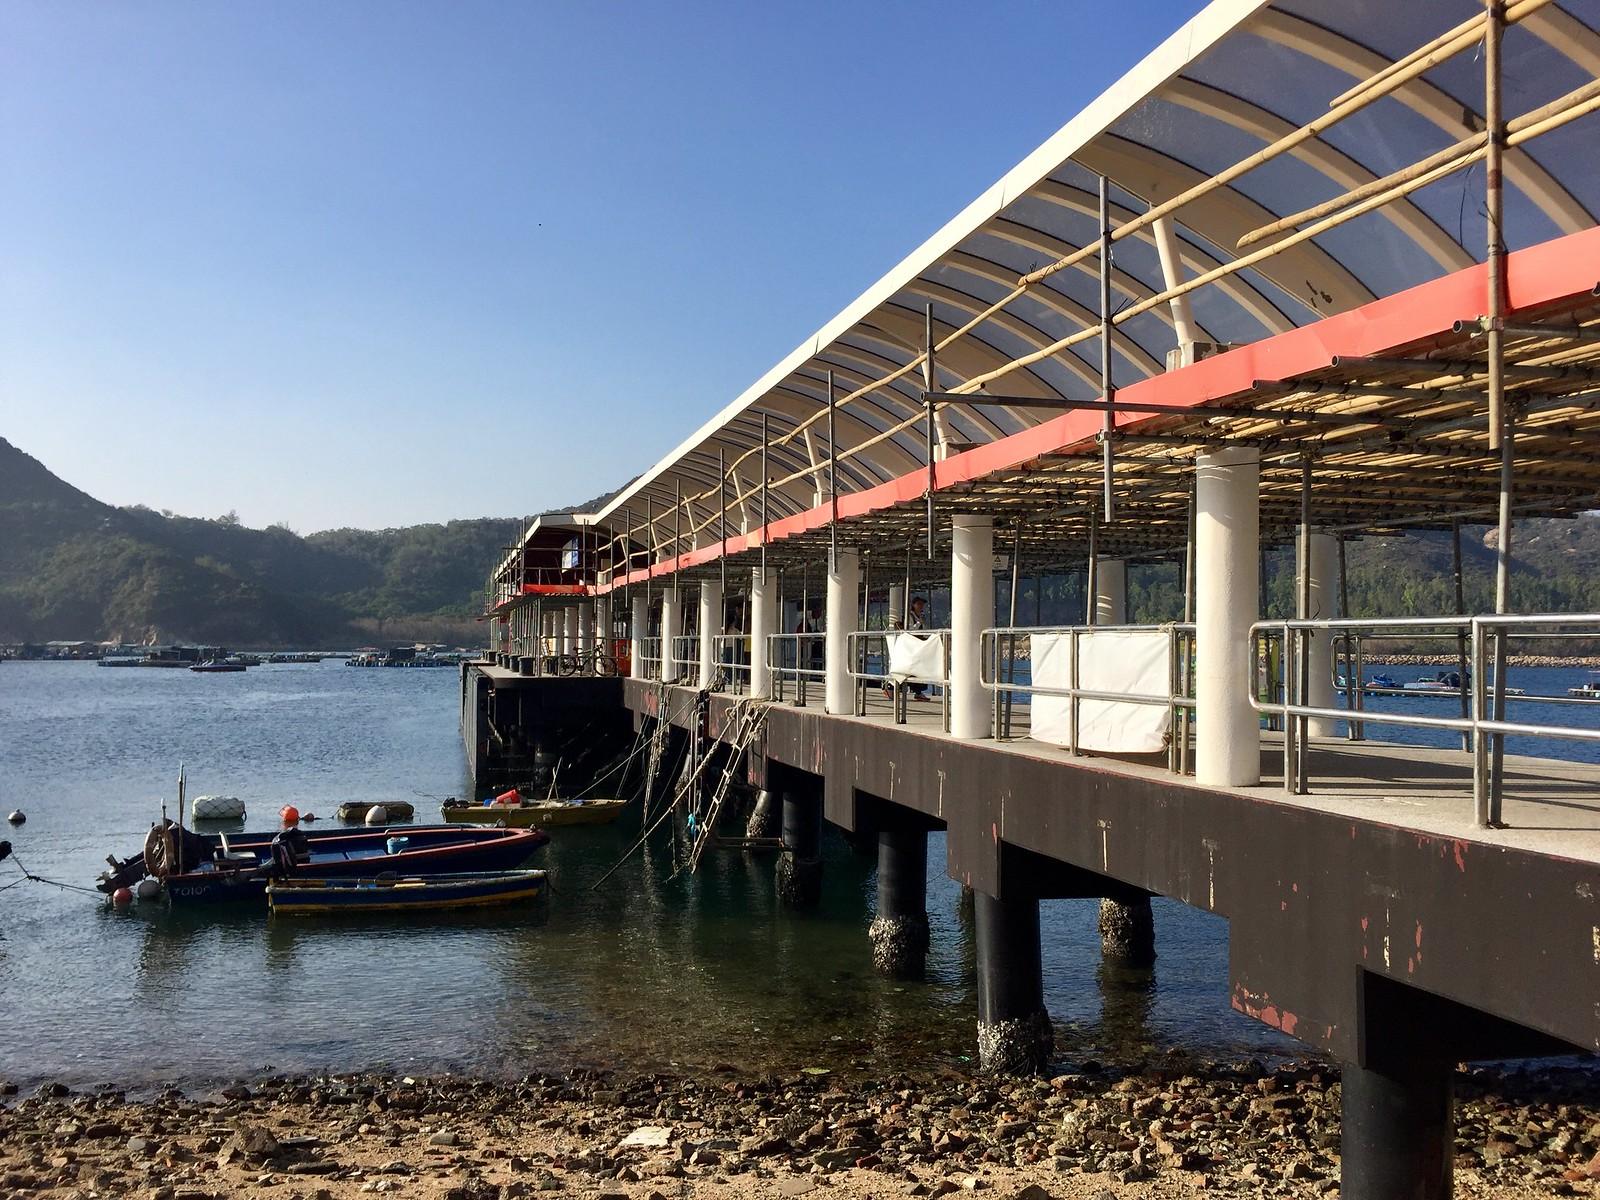 Sok Kwu Wan Ferry Pier 索罟渡輪碼頭